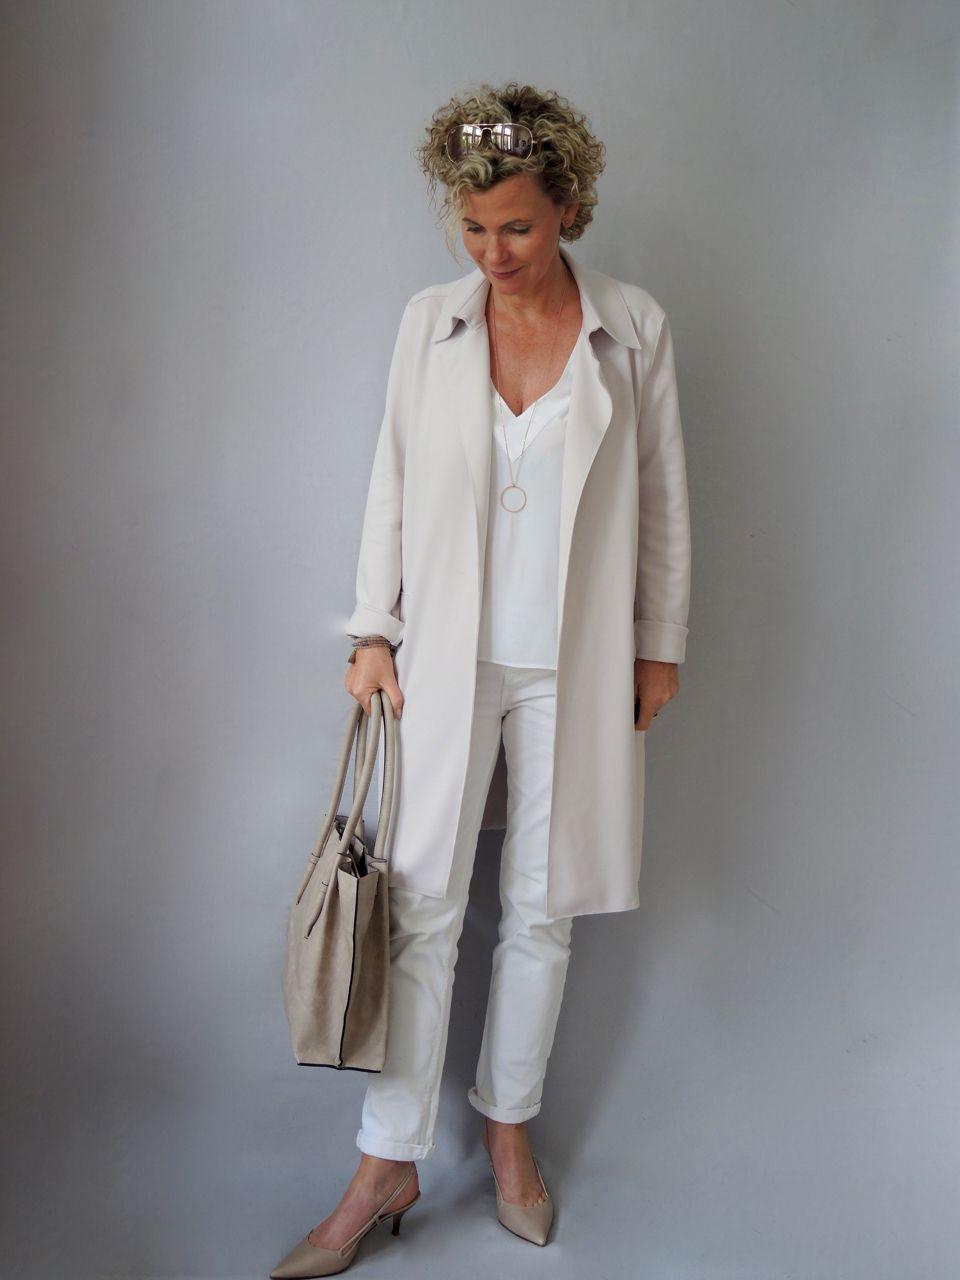 humanitarian. SSBBW Gesichtsbehandlung know how dress